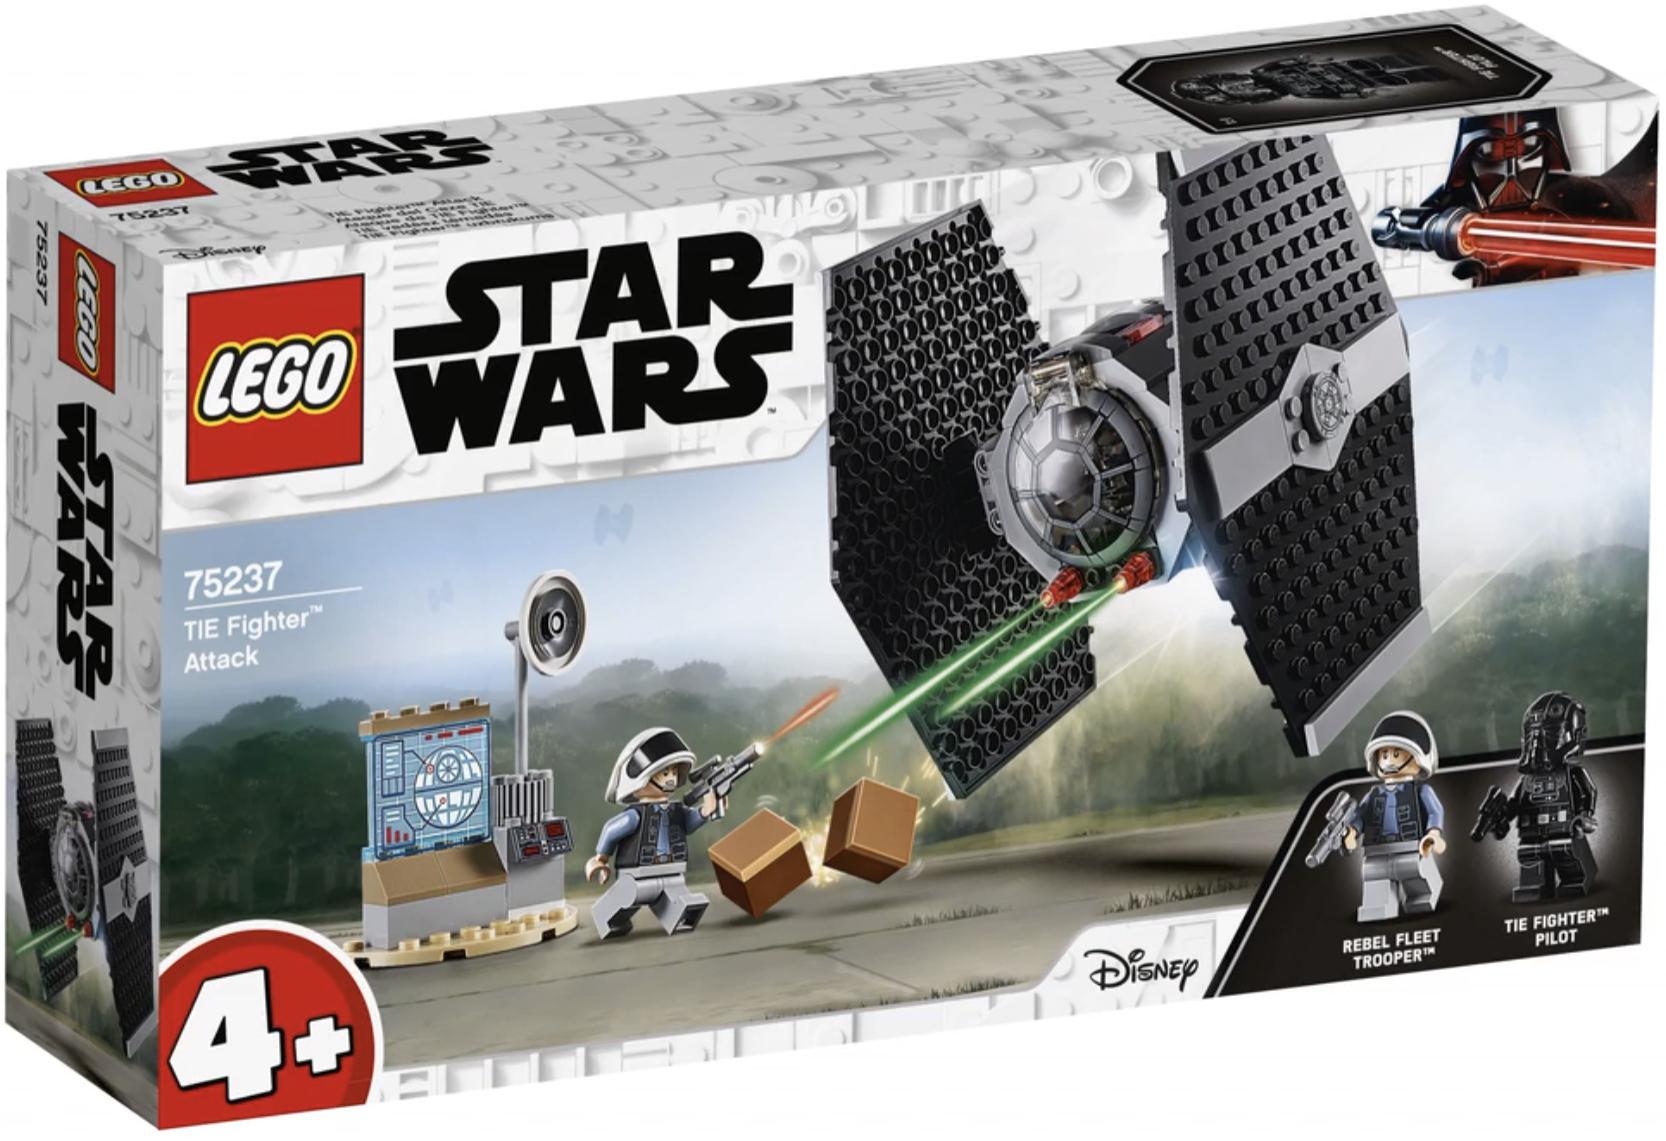 Rebelscum com: LEGO: Star Wars 4+ 2019 Sets